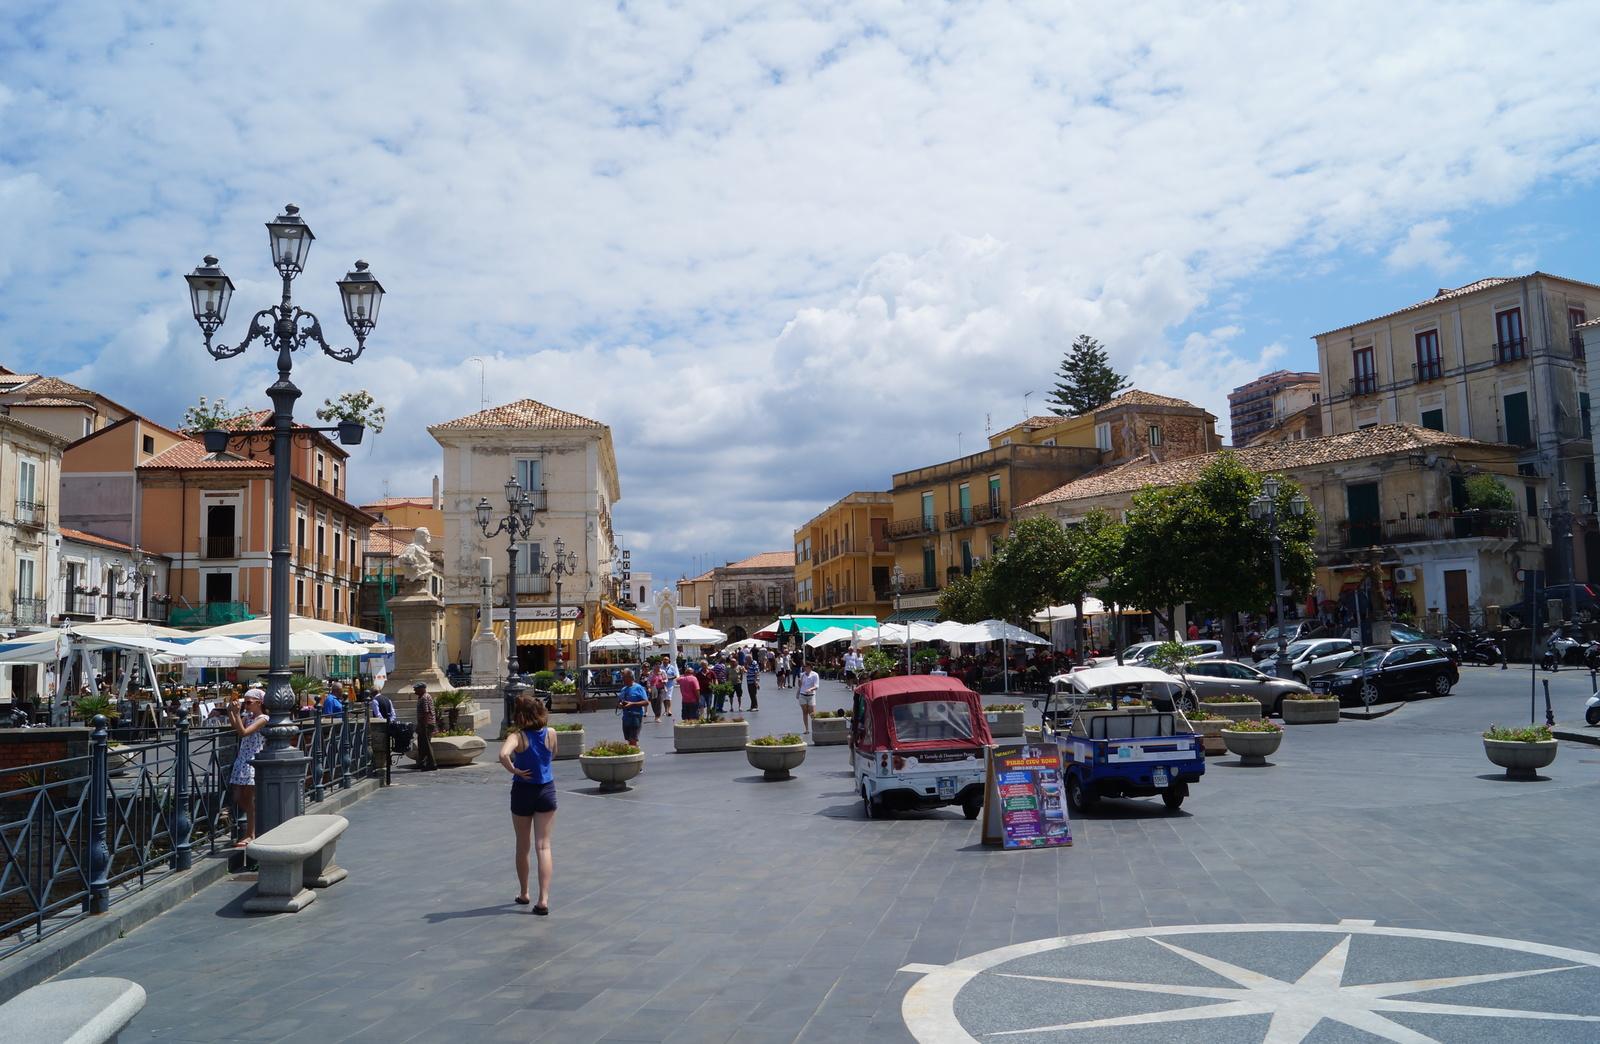 Площадь в Пиццо